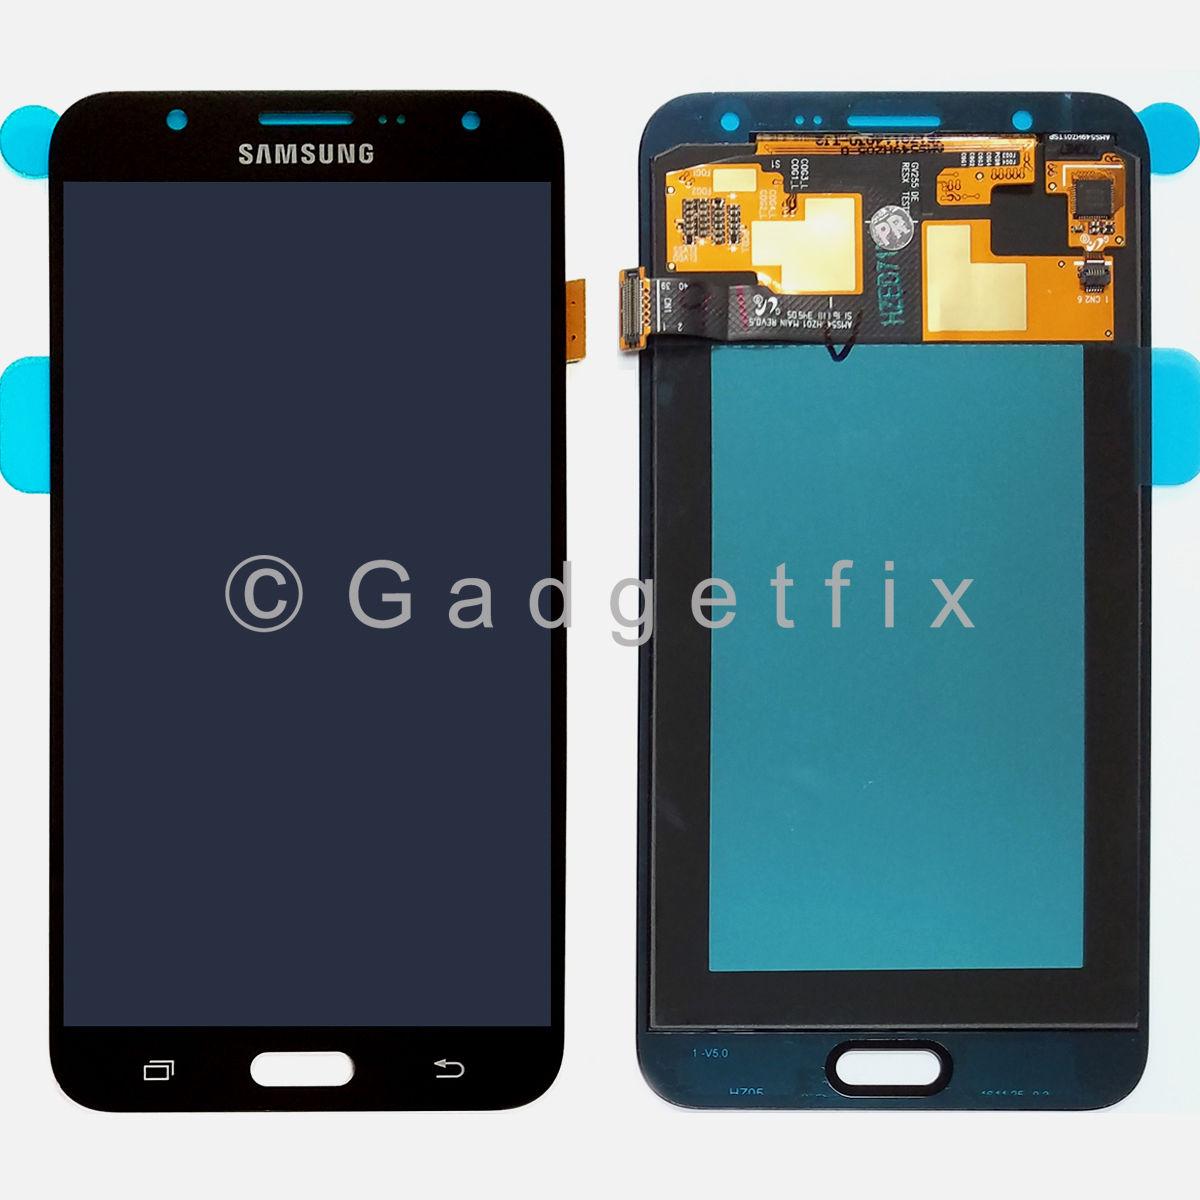 Samsung Galaxy J7 J700 J700F J700P LCD Display Touch Screen Digitizer Assembly